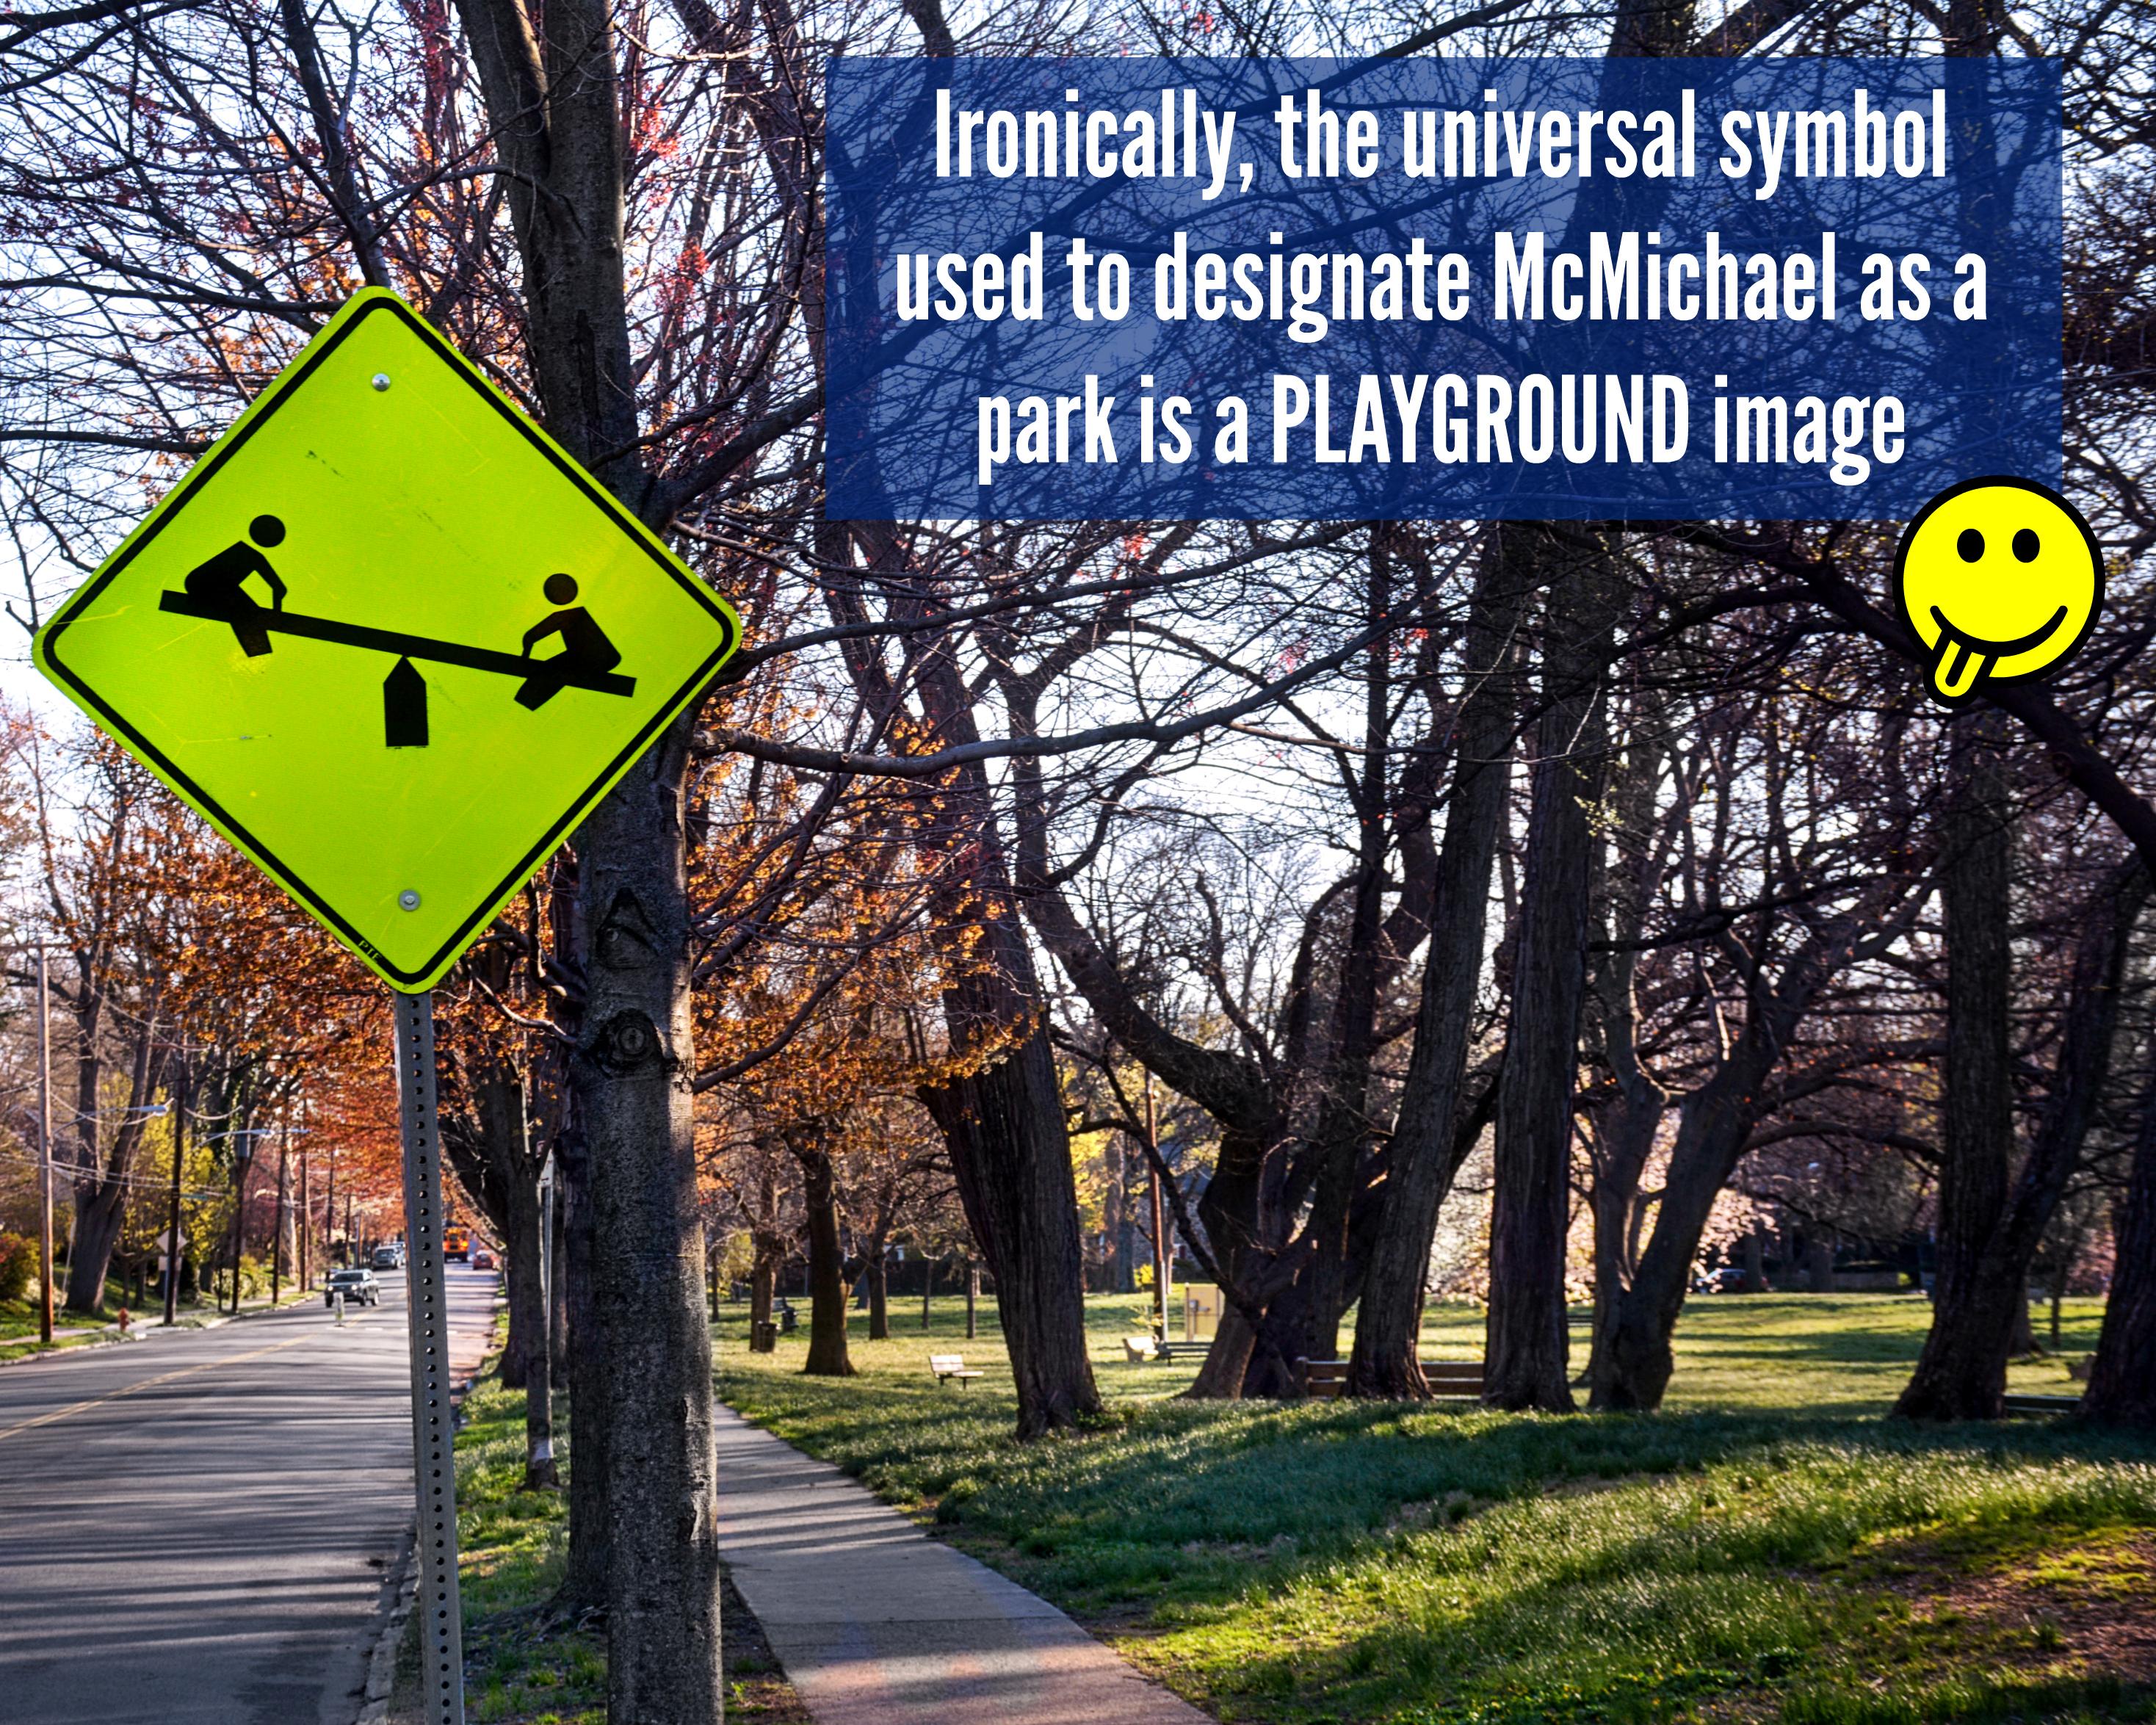 EastFallsLocal 4-8 mcmichael park sign teeter totter RESIZED text